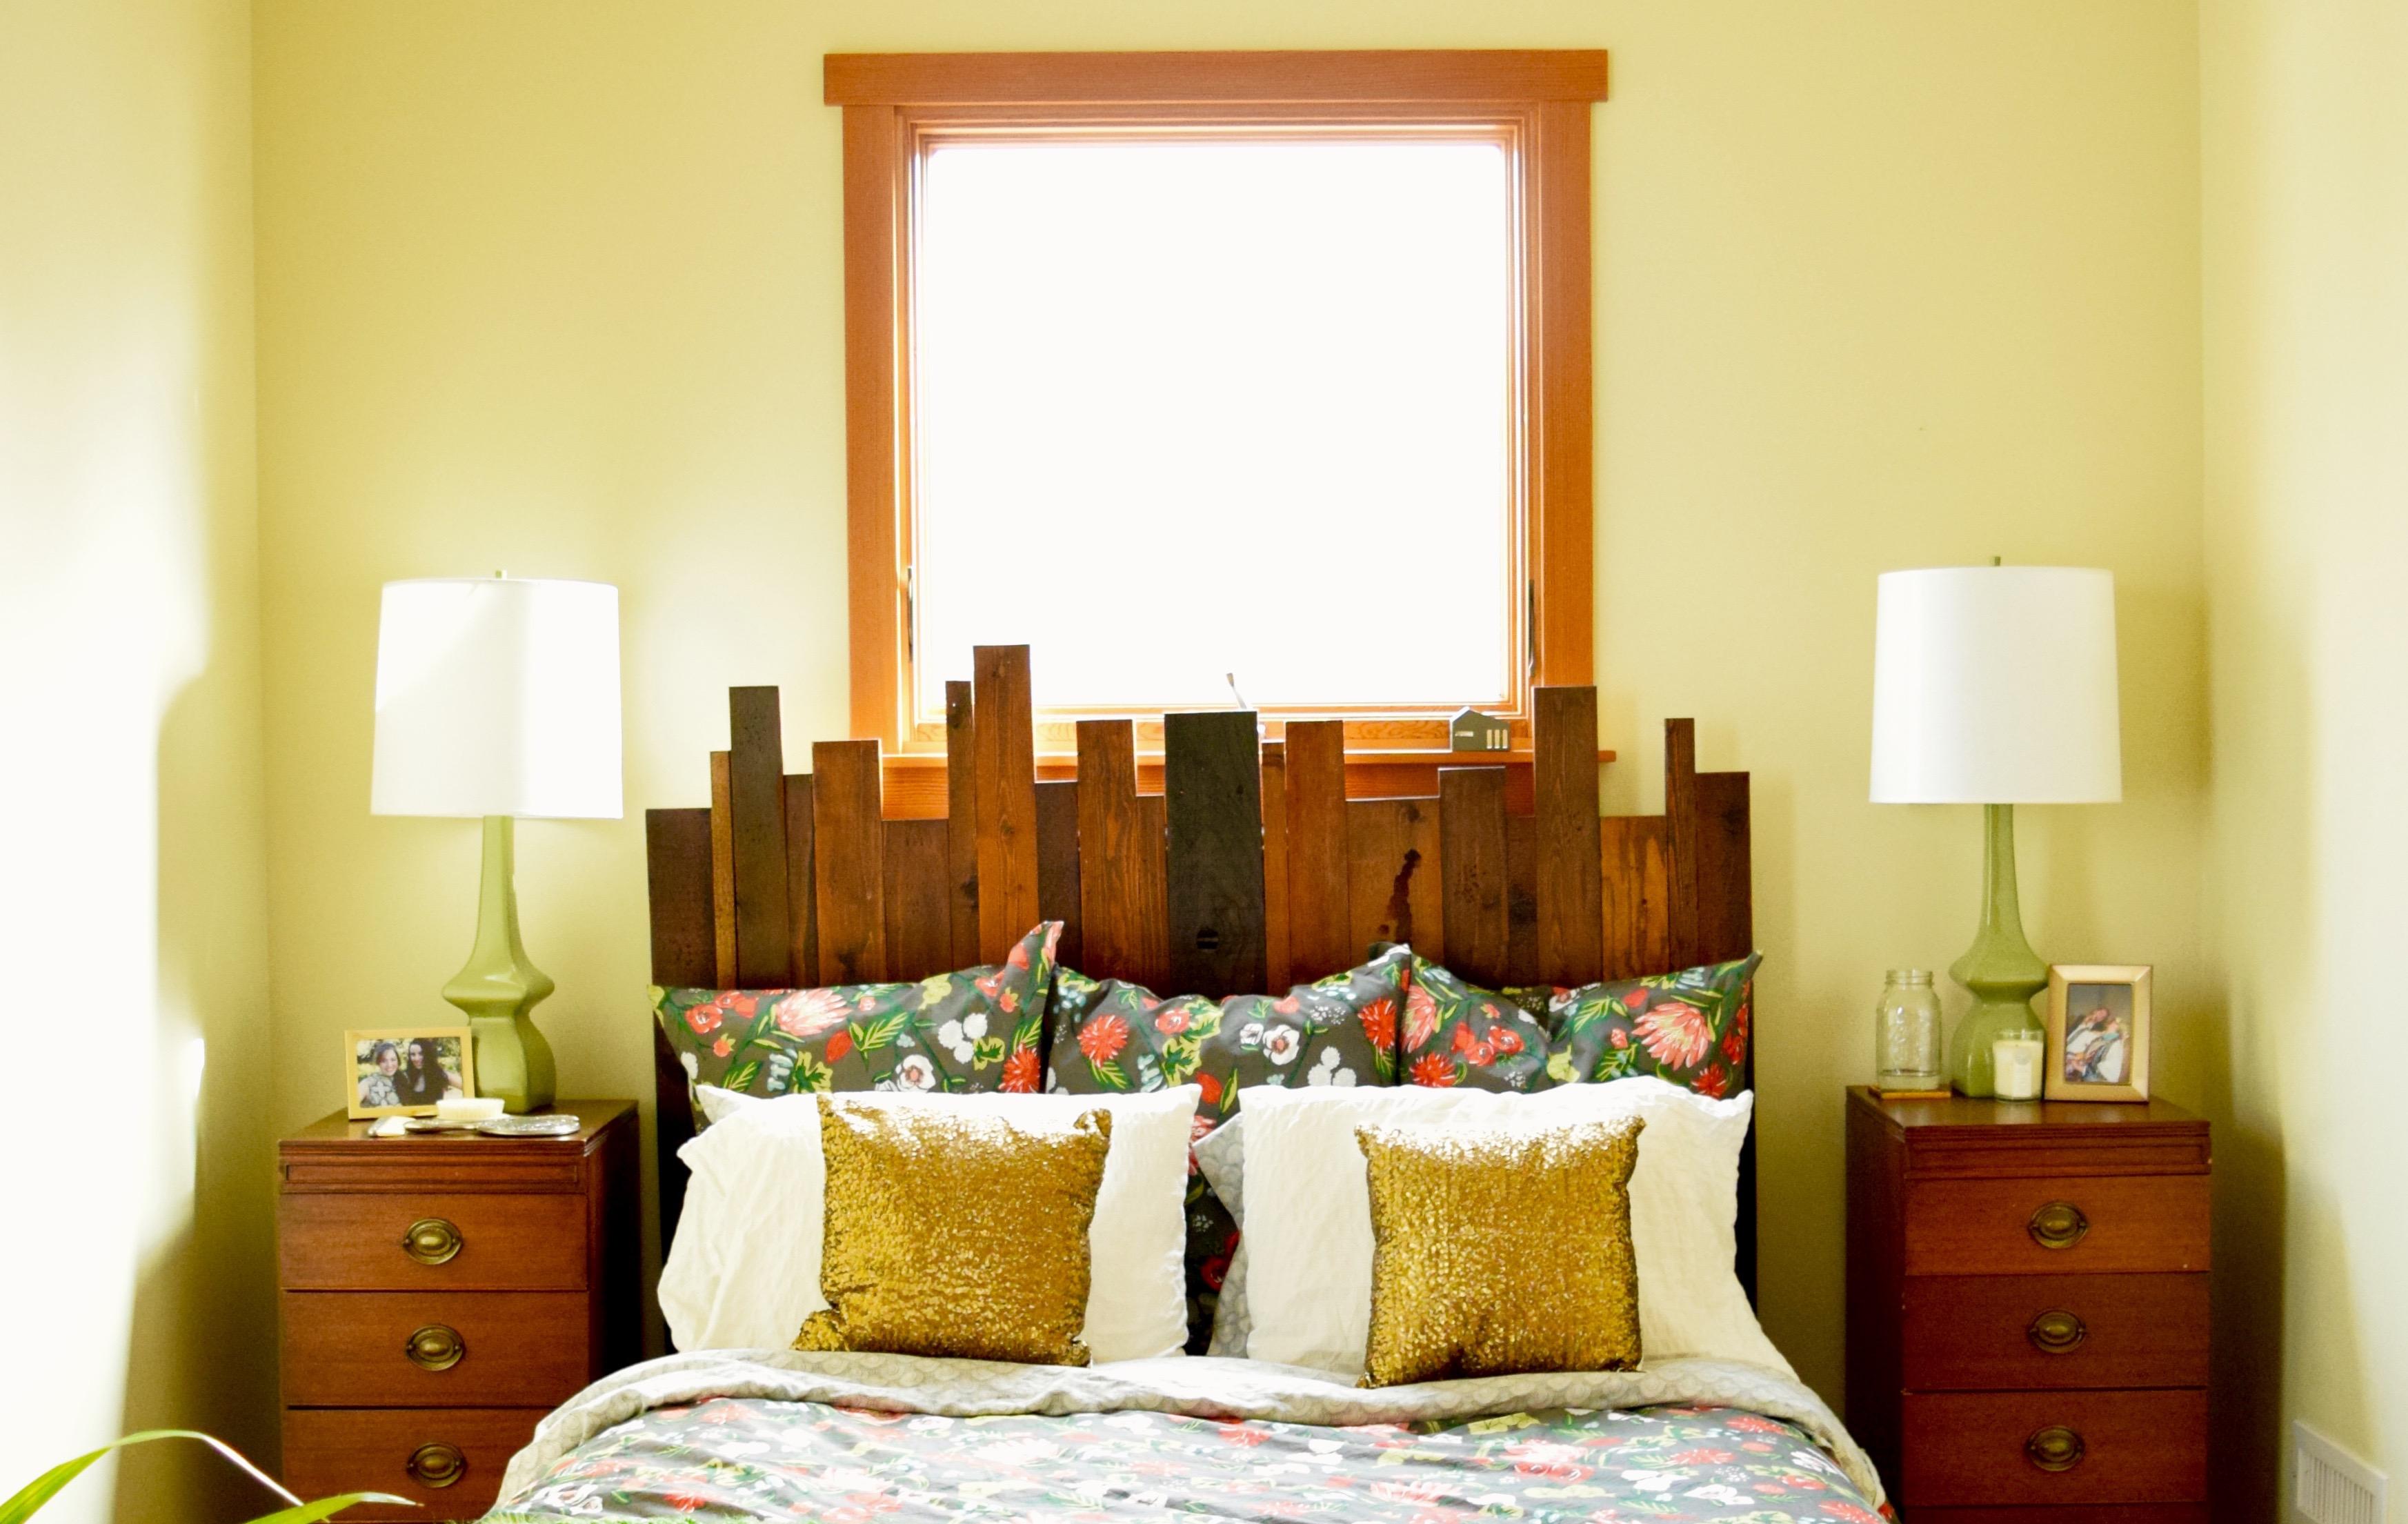 New Bedding | Land of Laurel